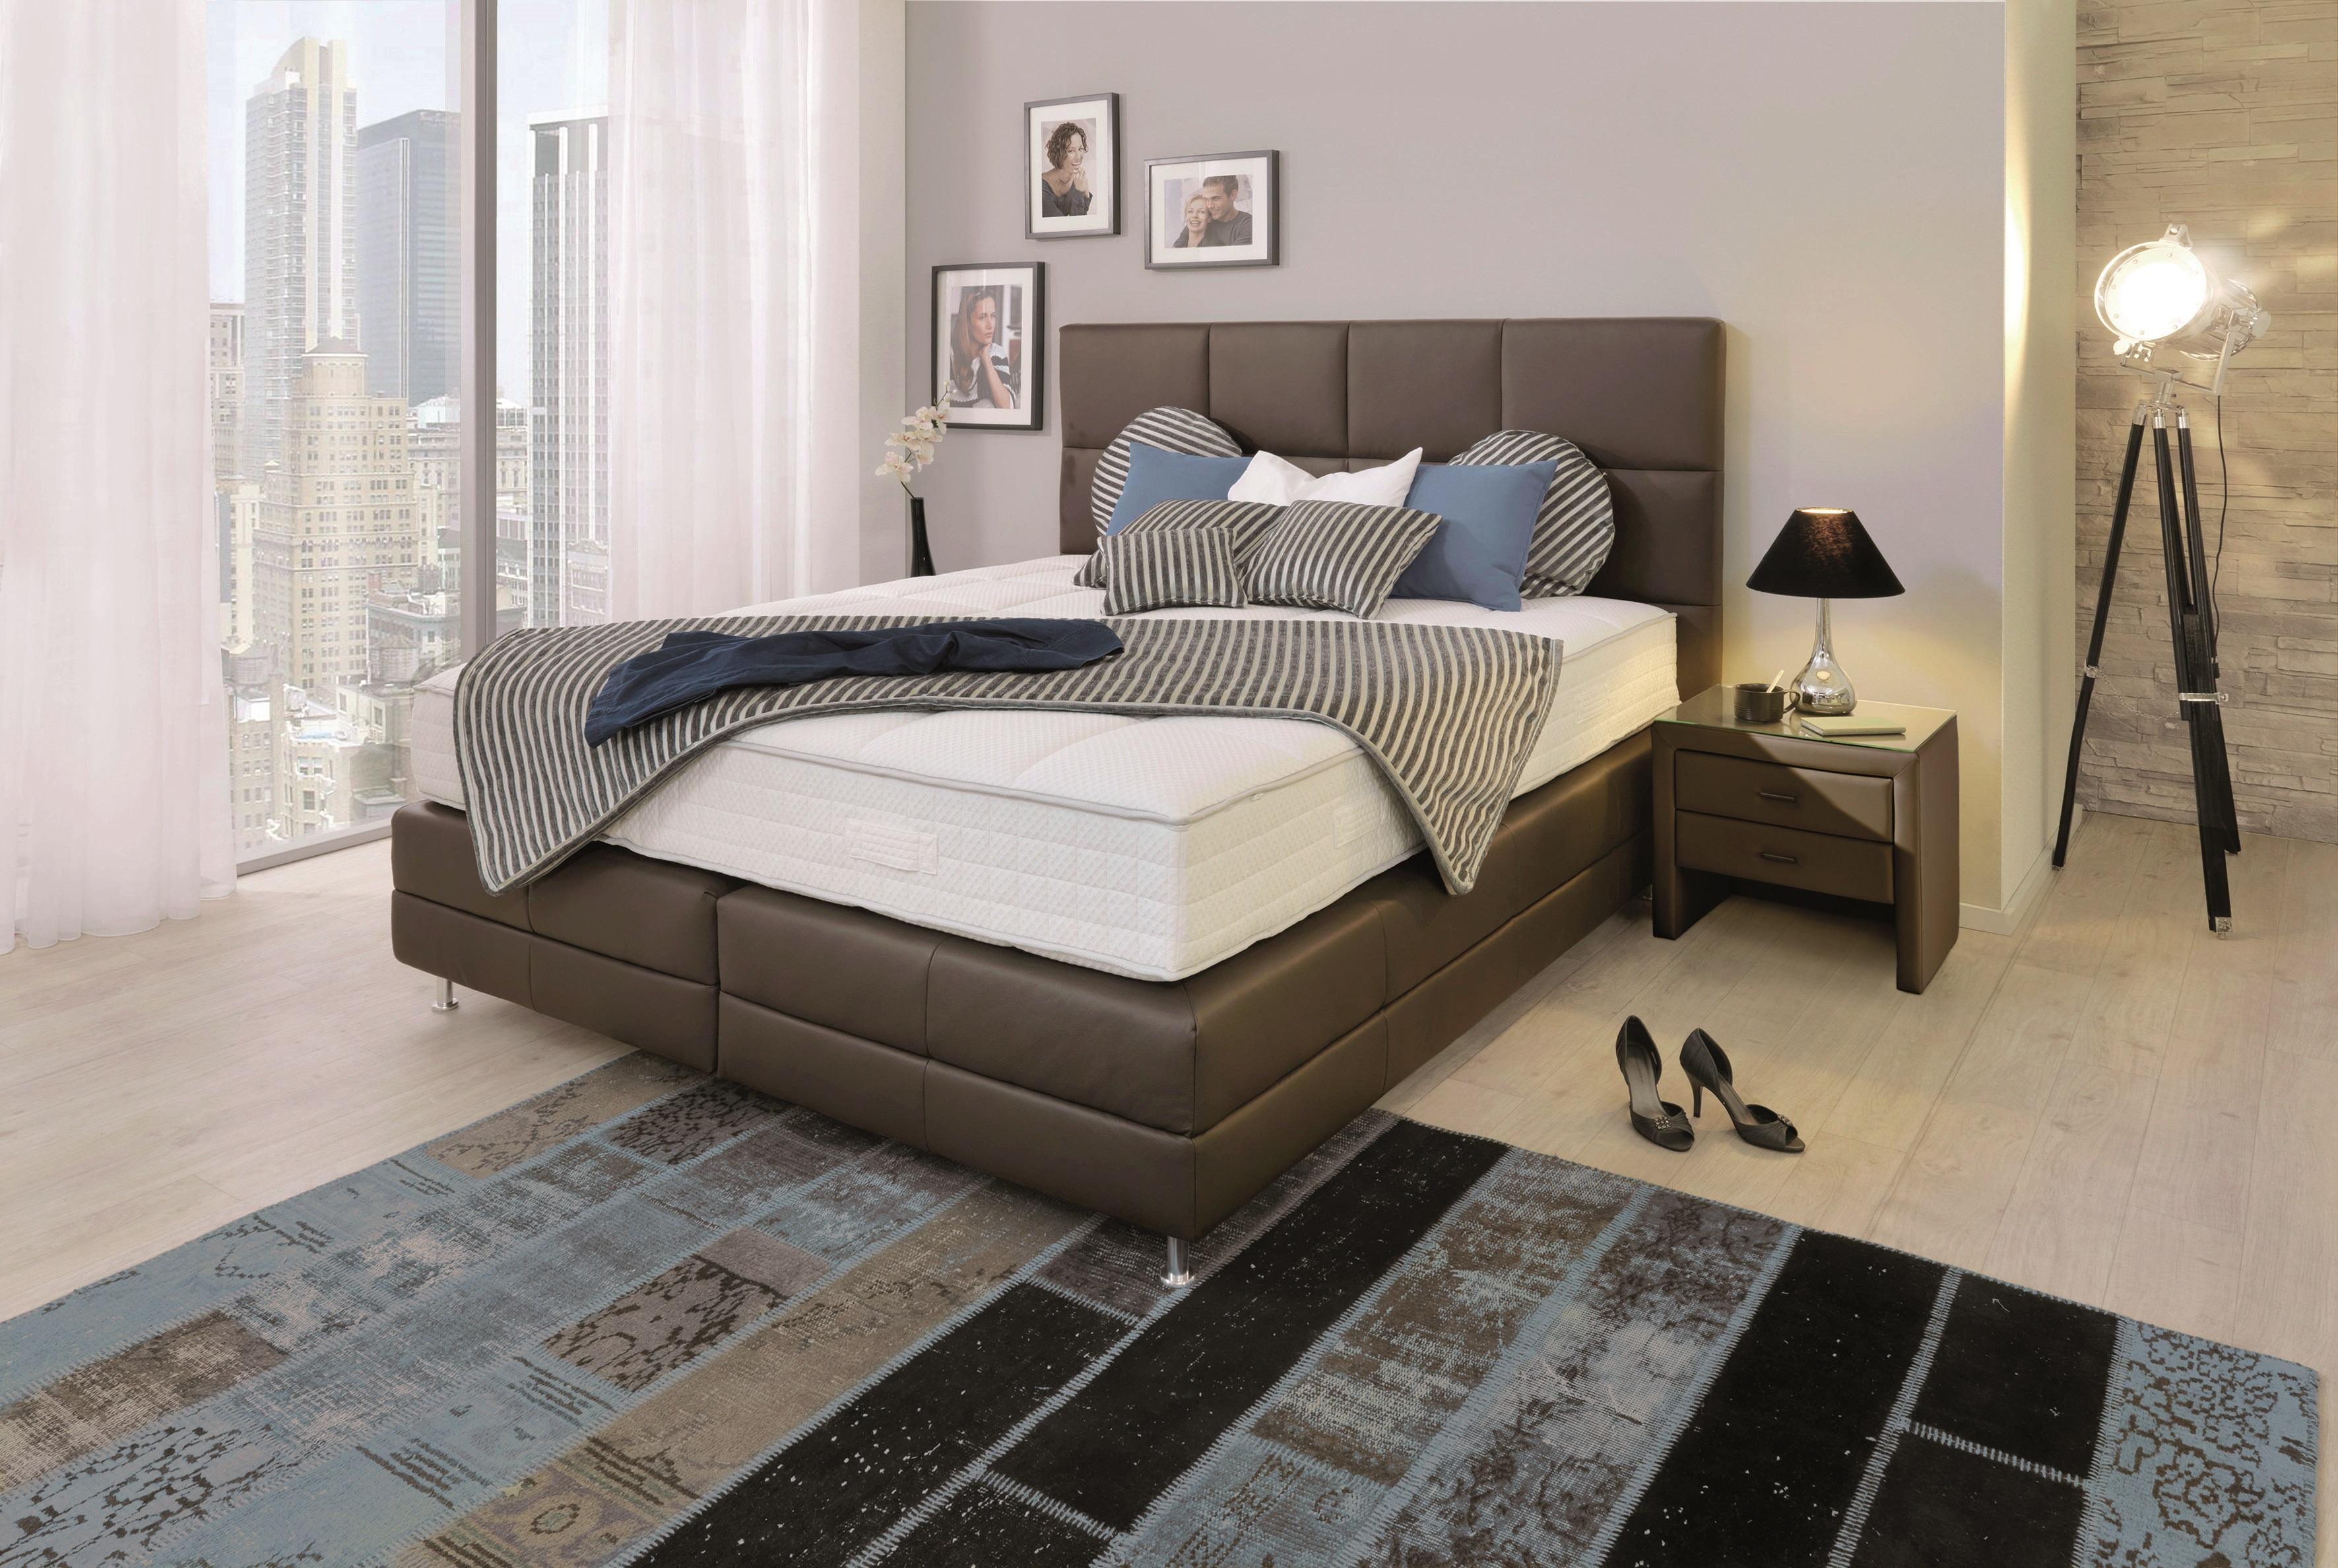 monti 39 s m belhaus ag boxspringbett modelle ms plus. Black Bedroom Furniture Sets. Home Design Ideas